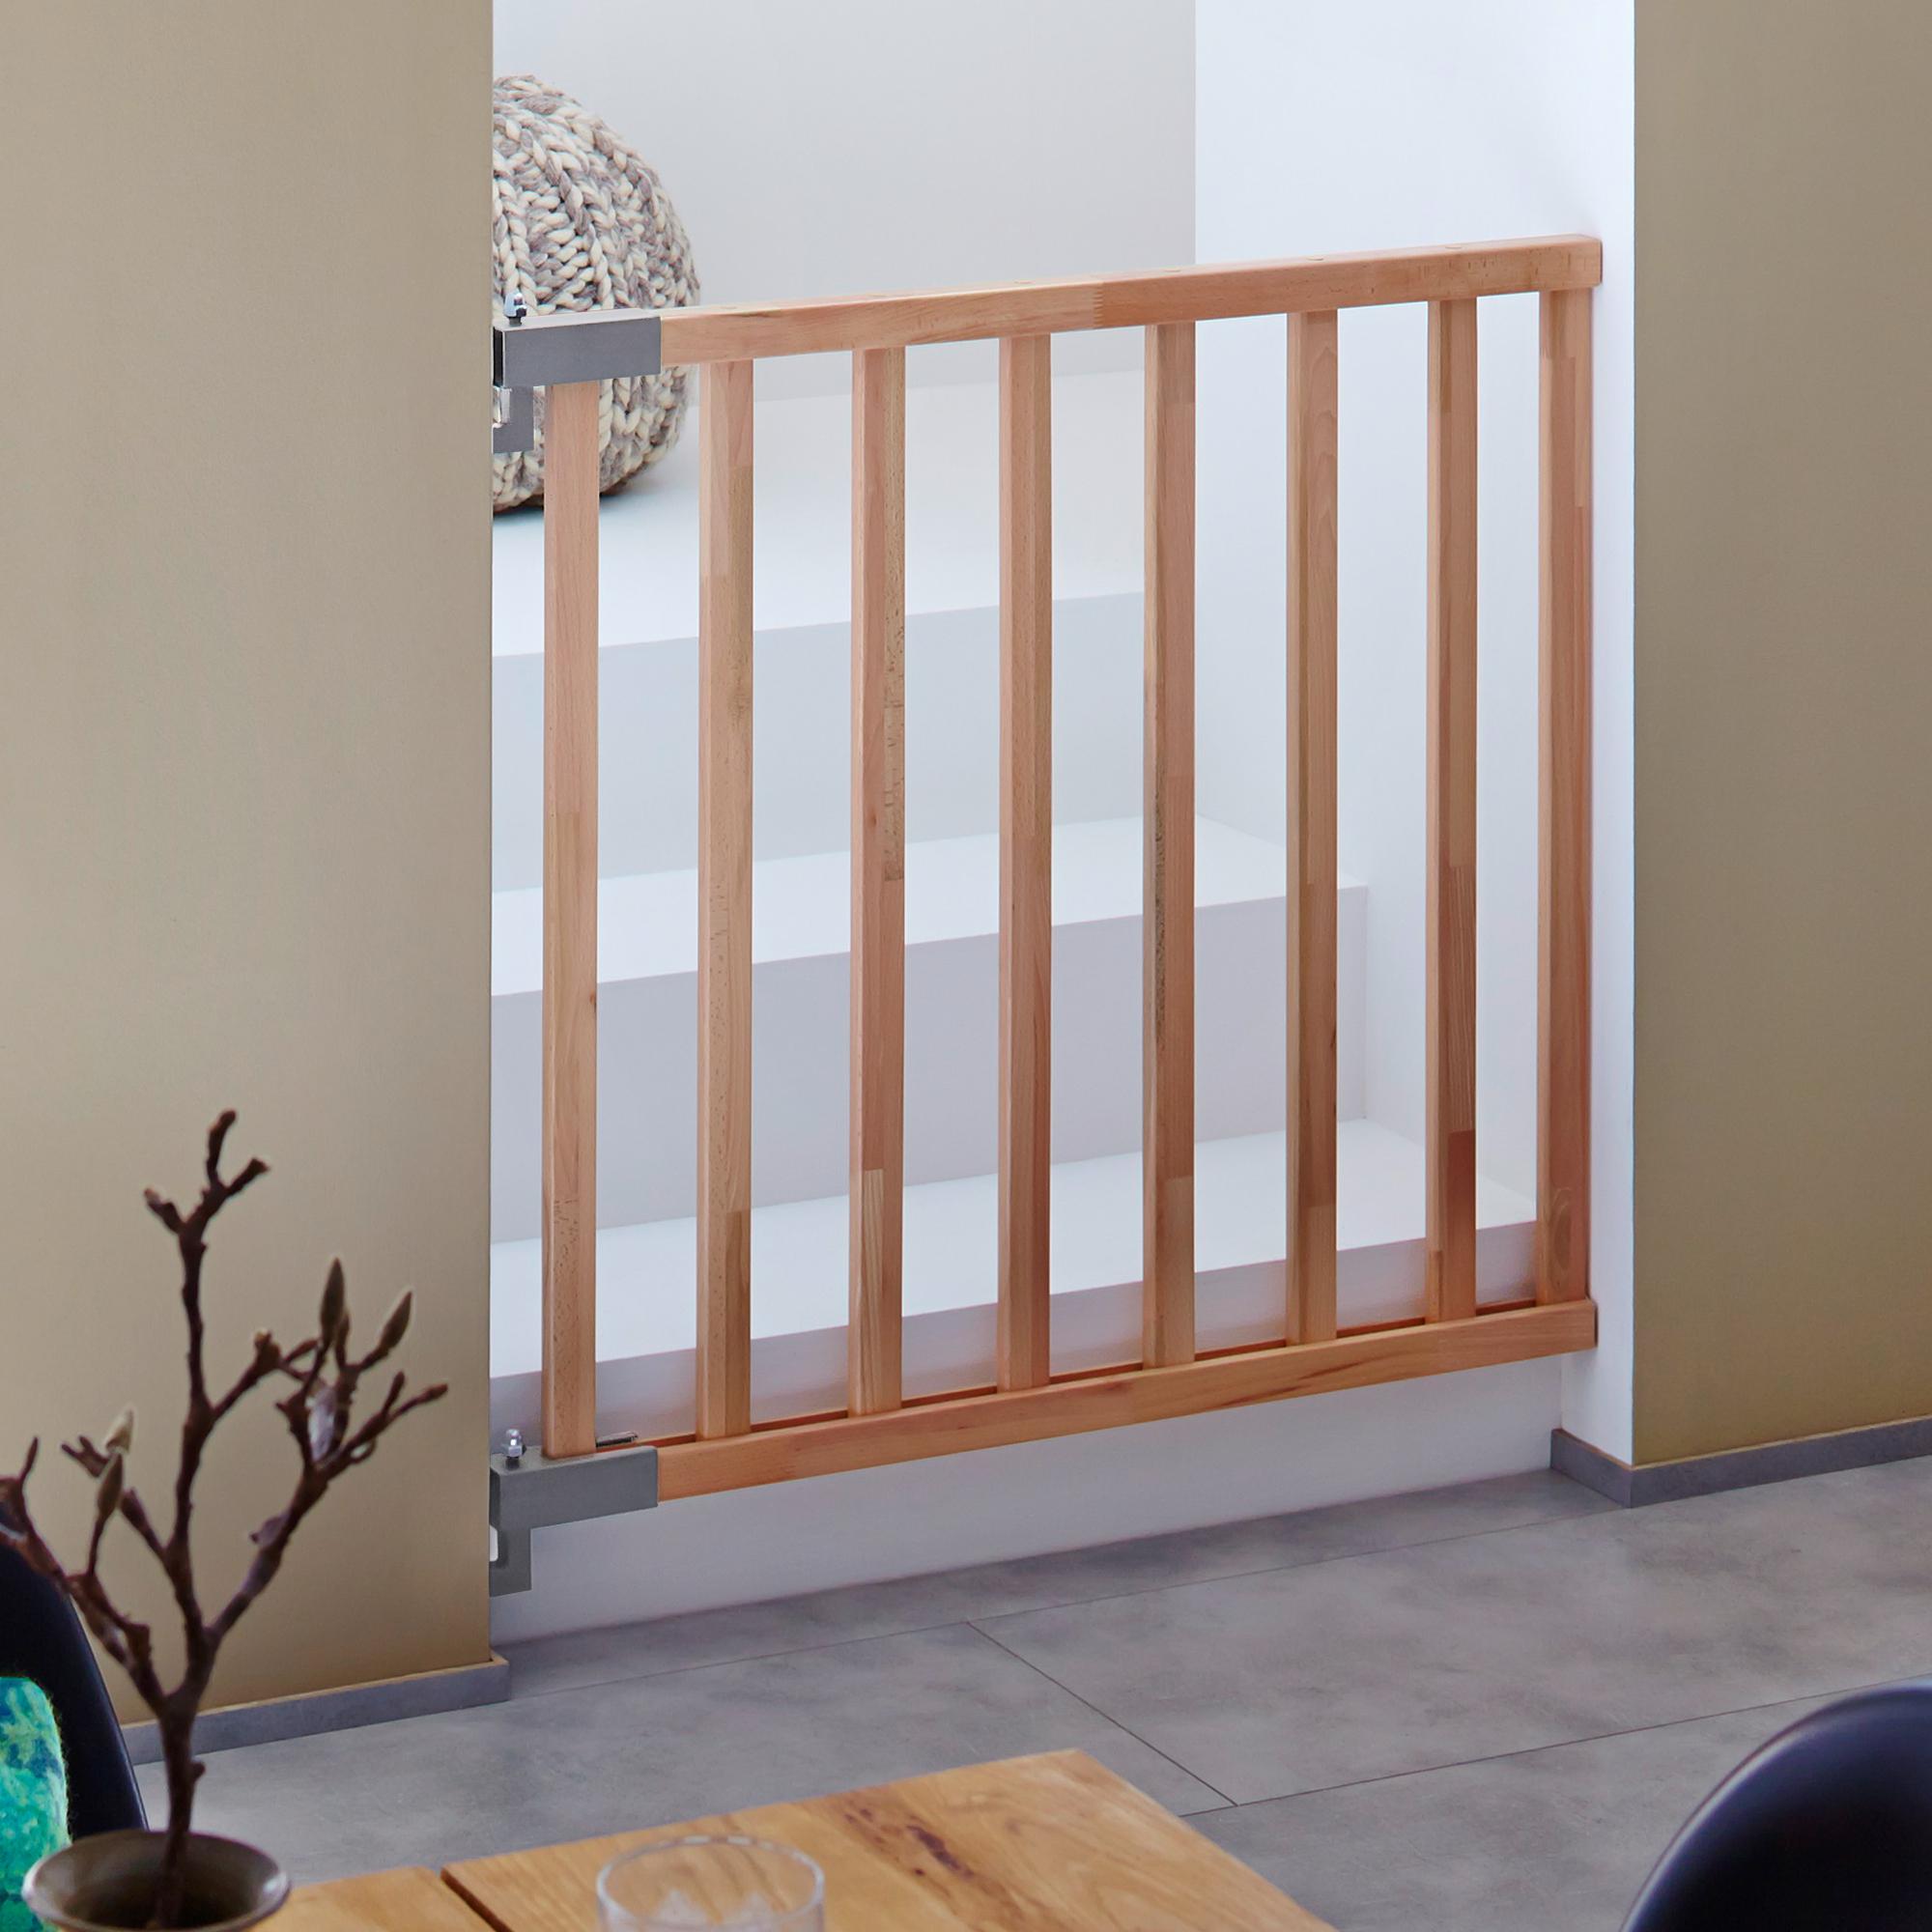 kinderschutzgitter jan ideal f r treppen t ren flure. Black Bedroom Furniture Sets. Home Design Ideas